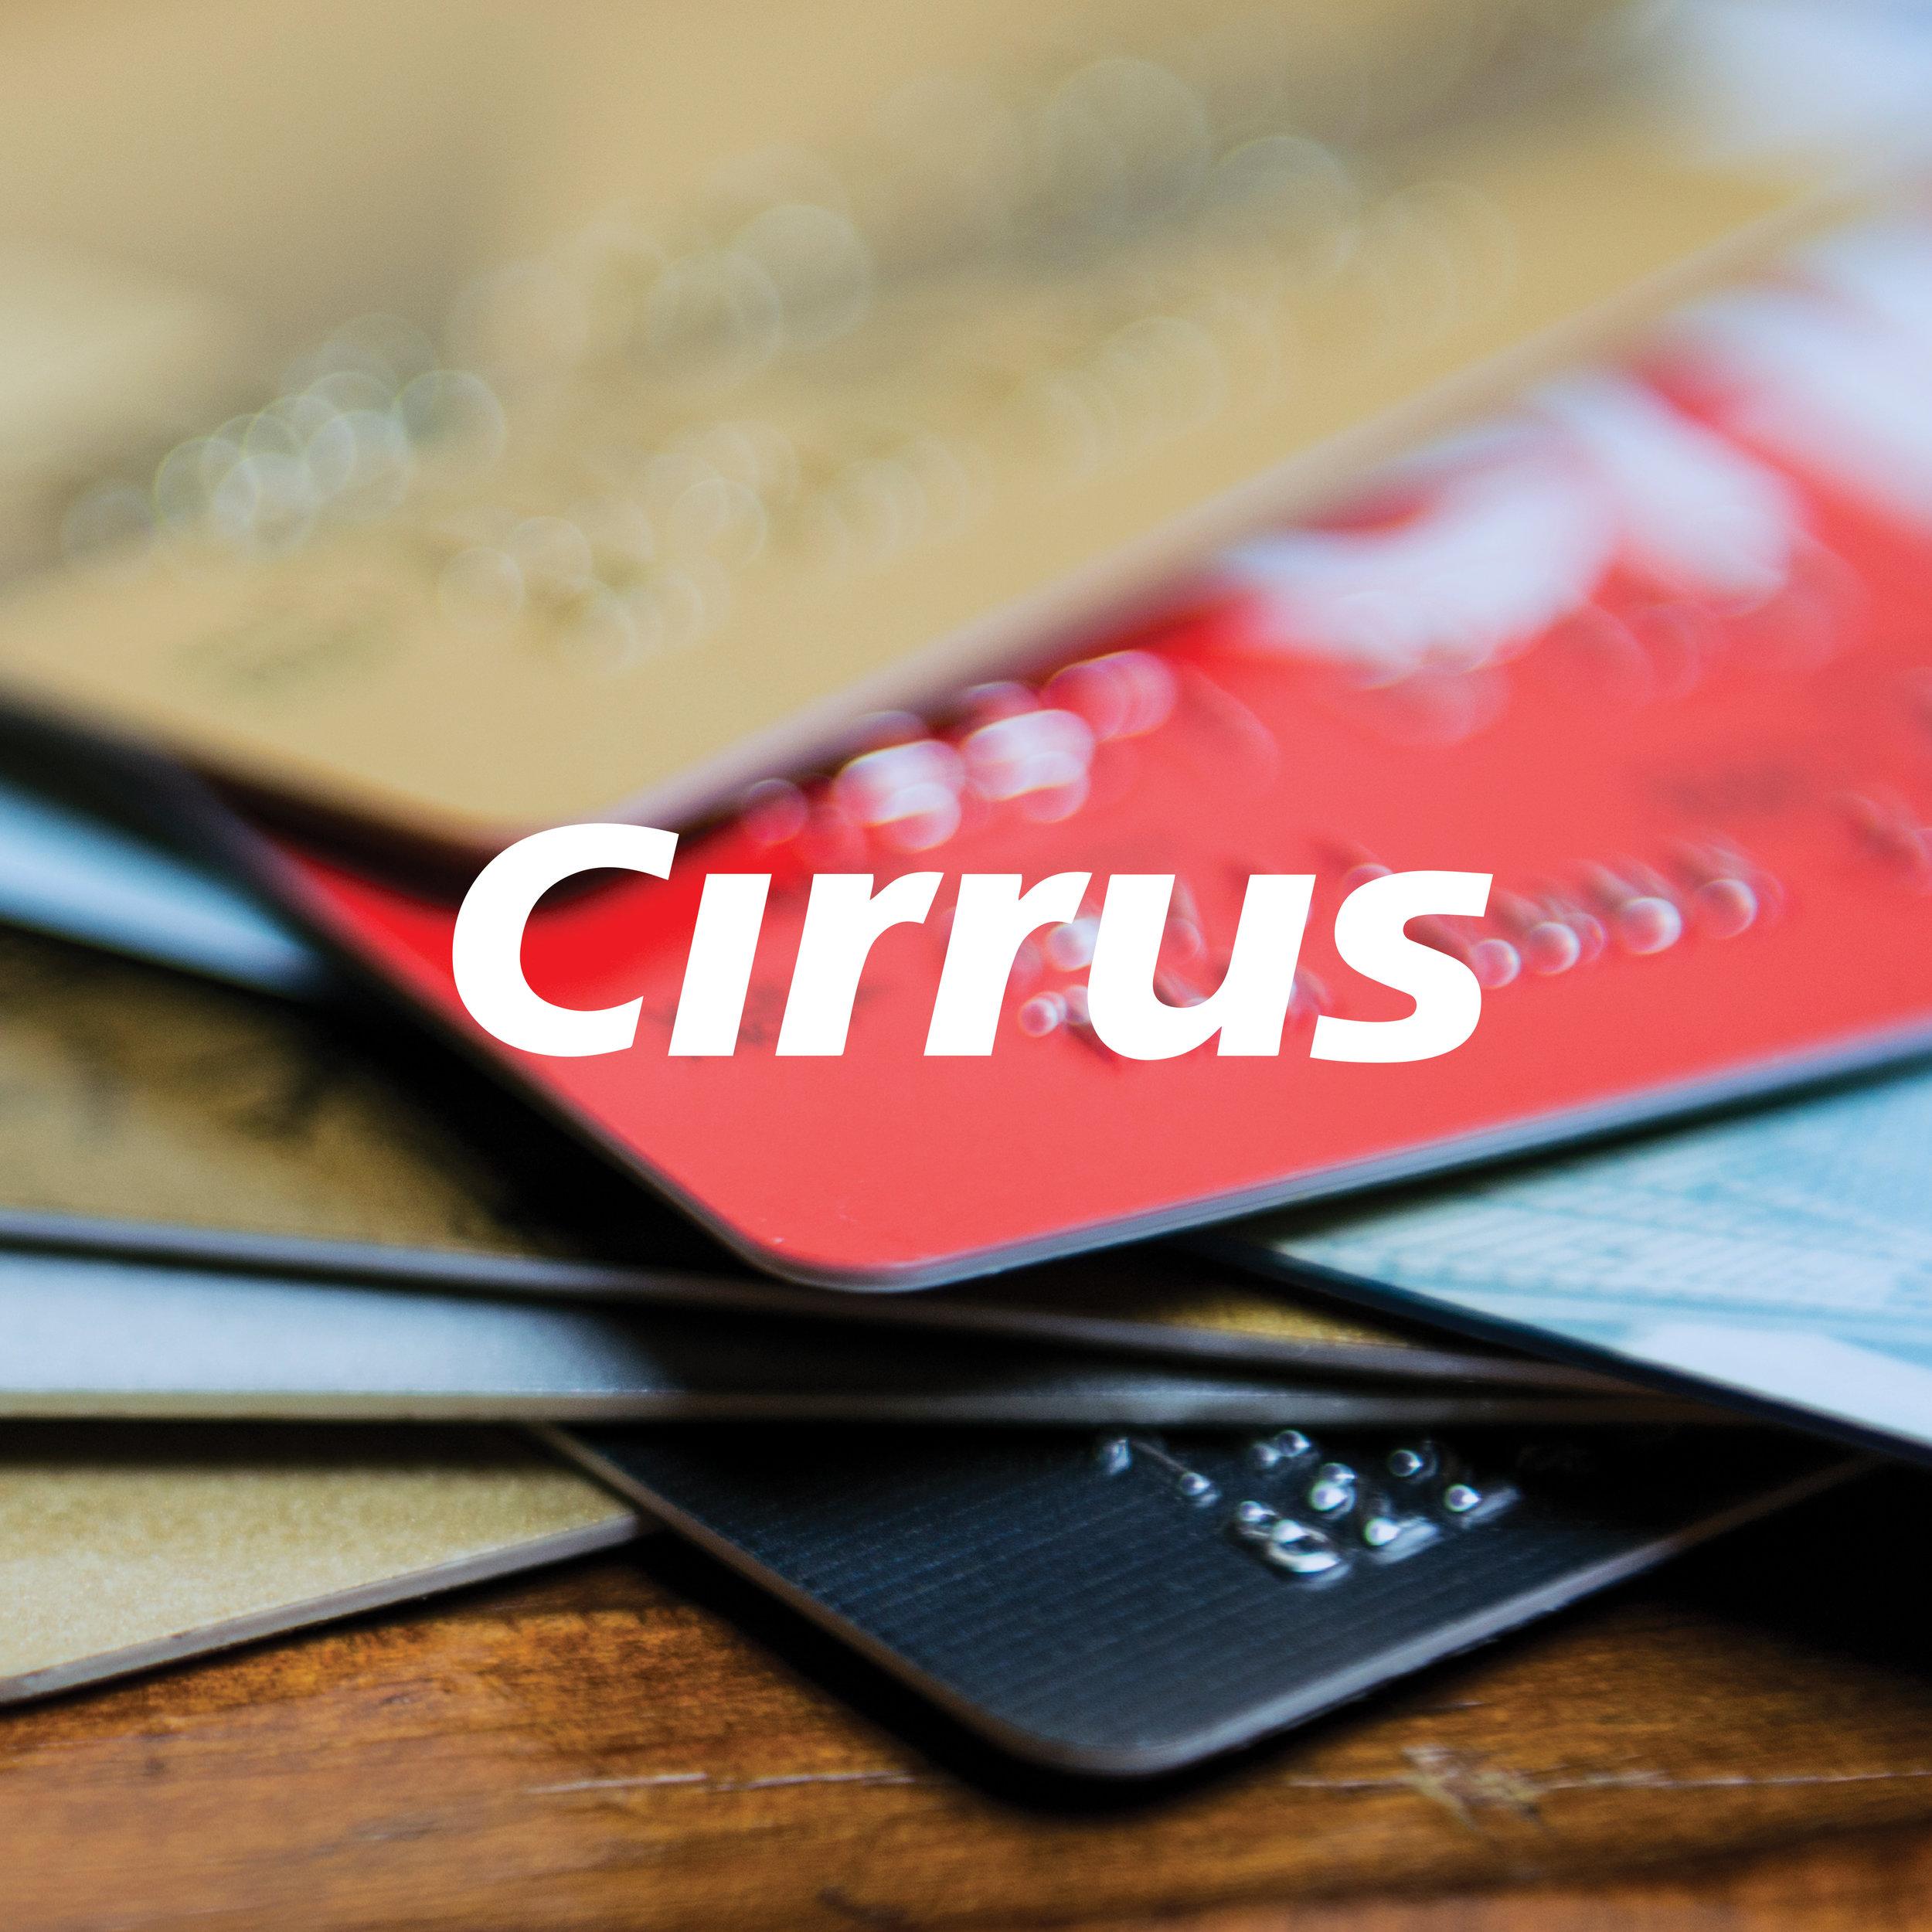 Cirrus (MasterCard)